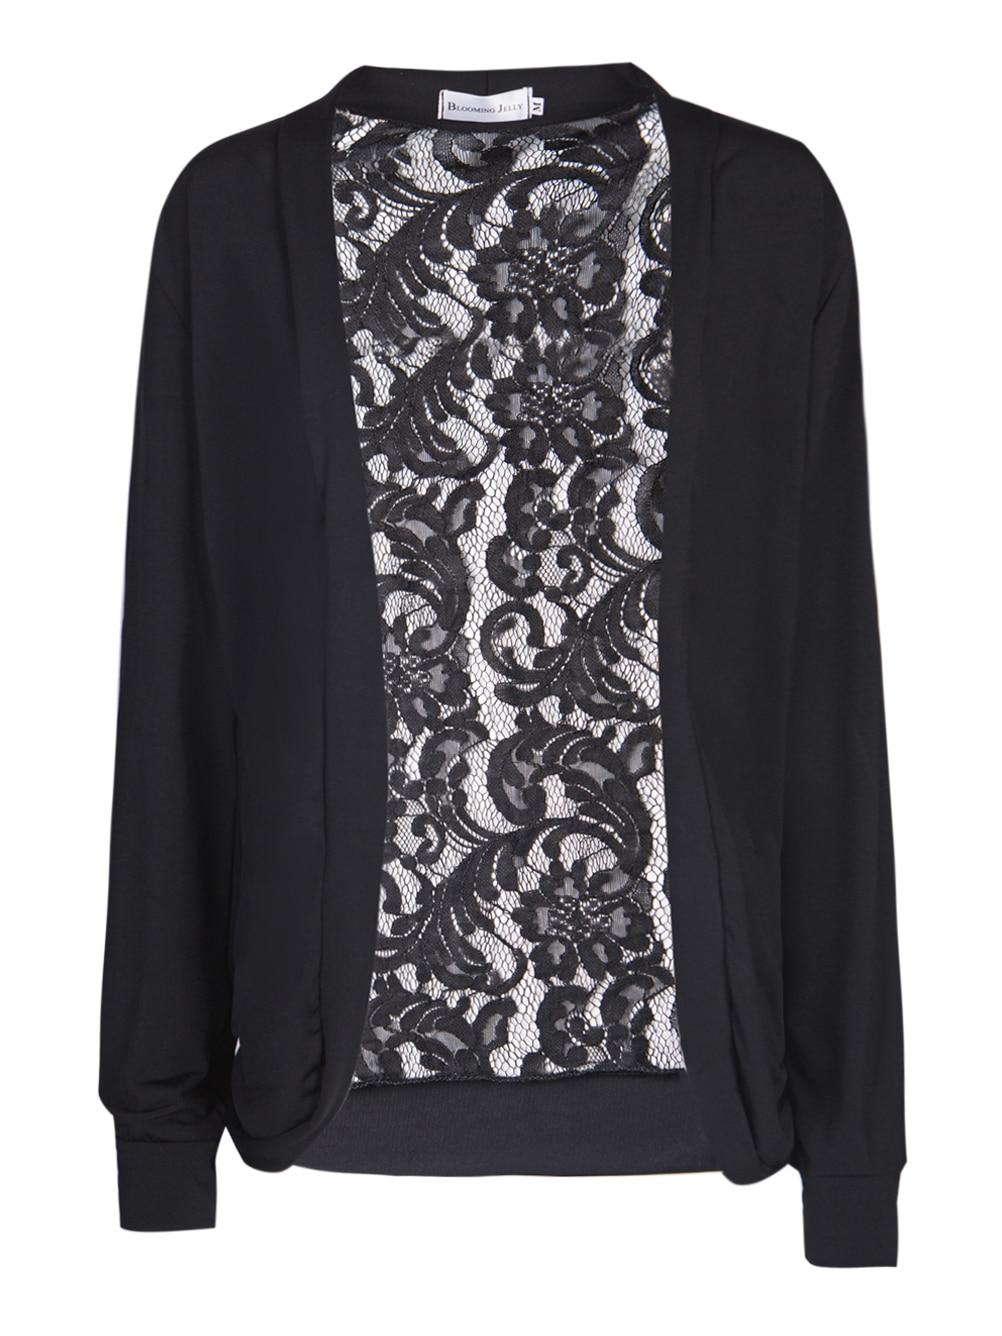 Aliexpress.com : Buy Floral Lace Black Cardigan Kimono Crochet Top ...